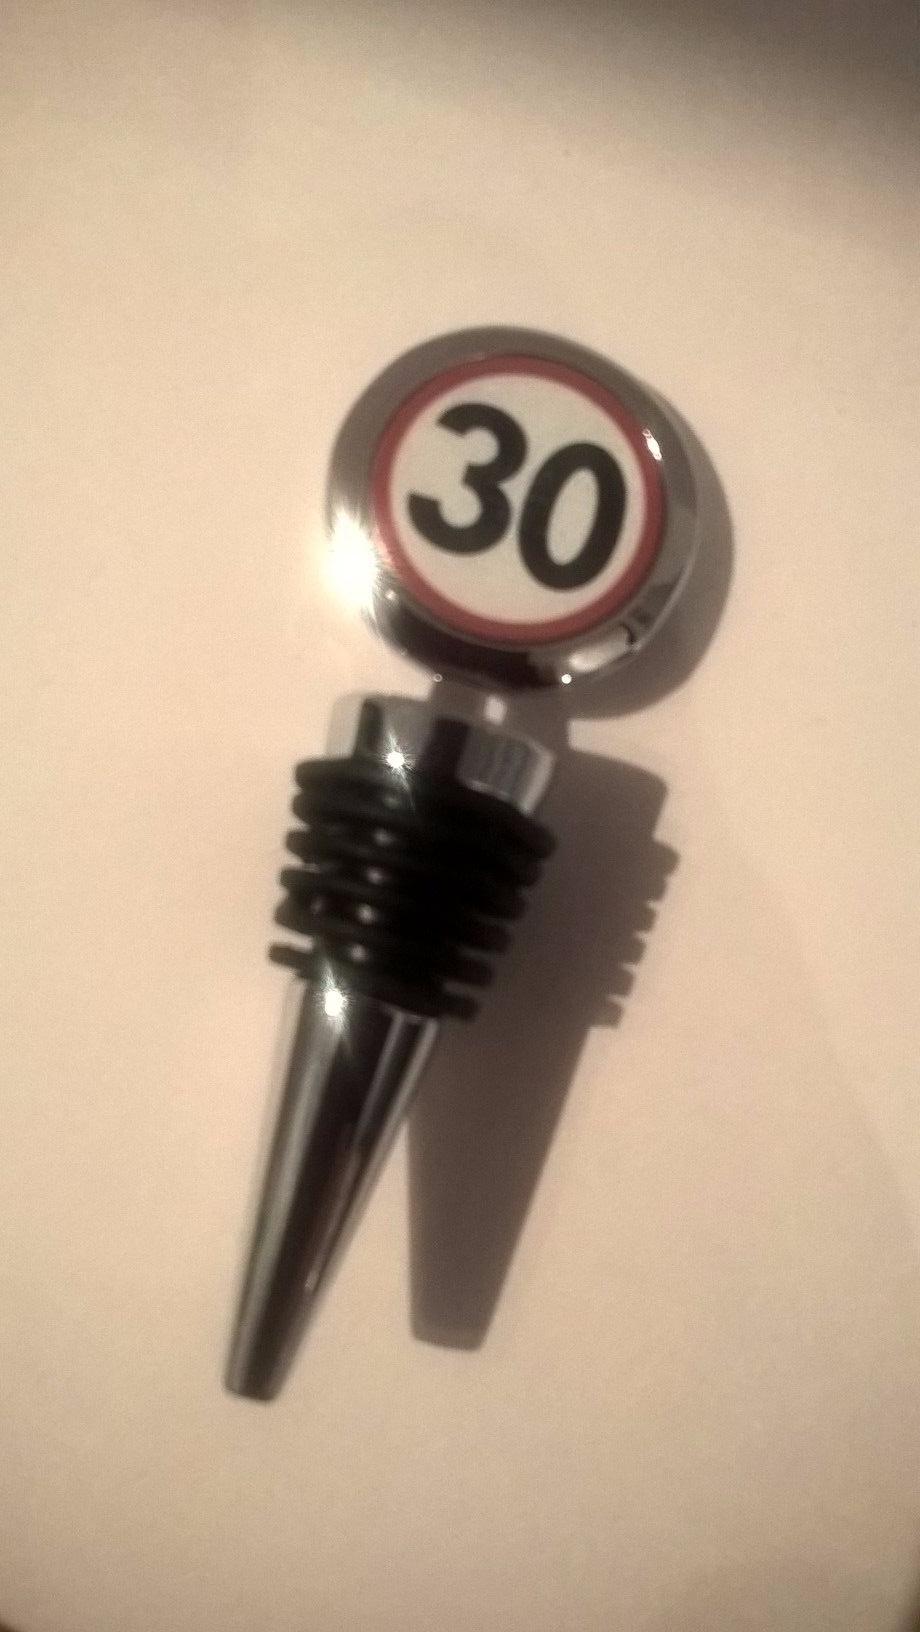 30th Birthday bottle stopper